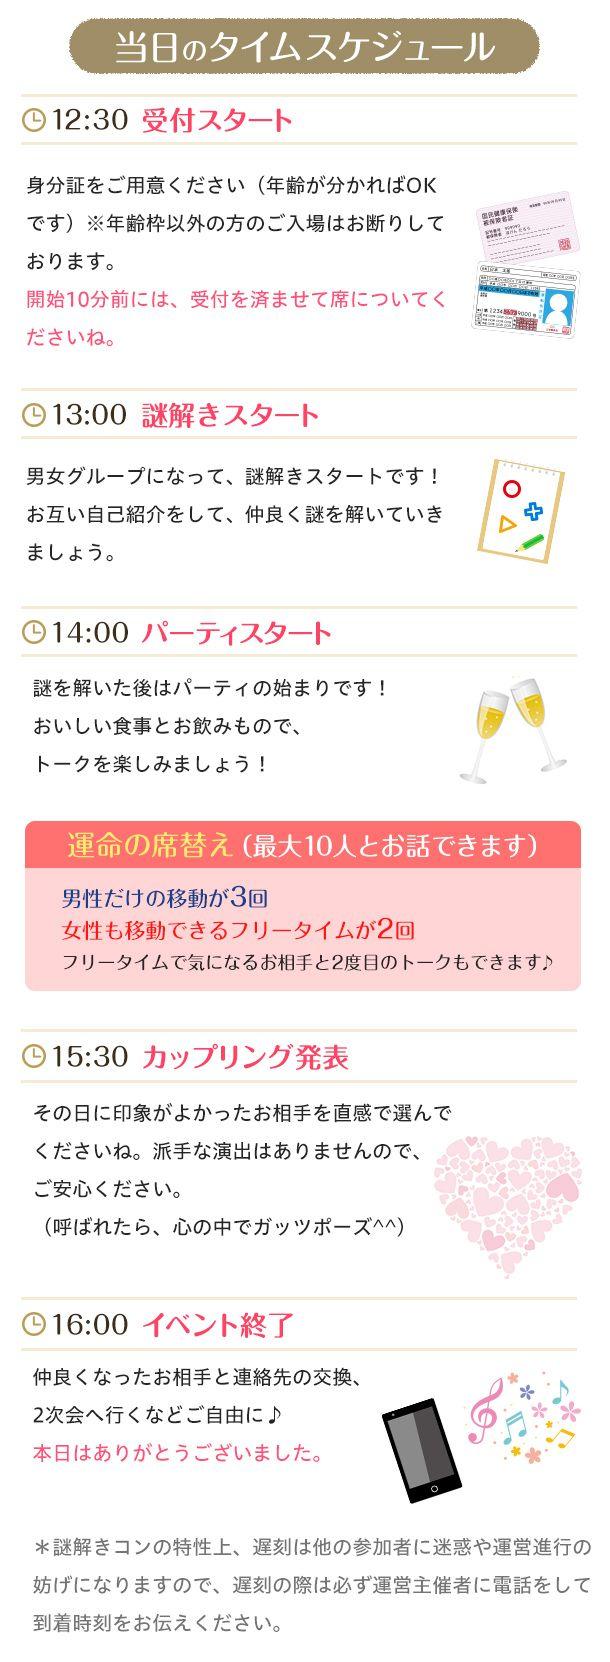 timeschedule (2)